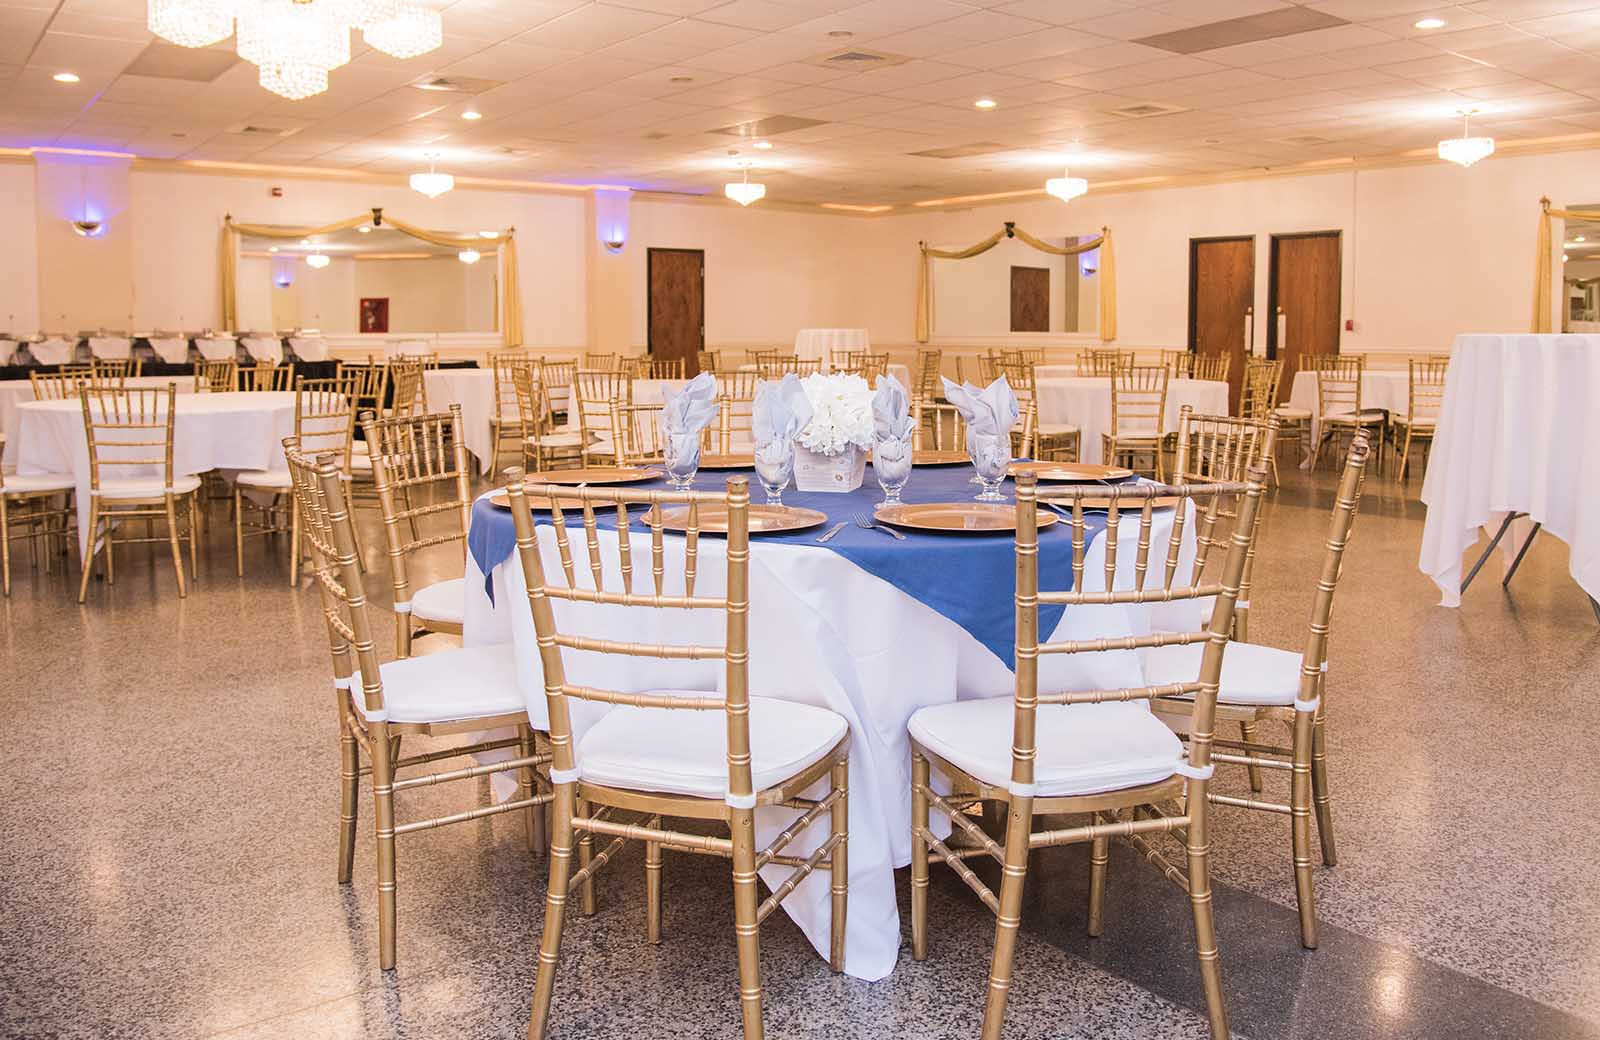 wedding venue - pictures